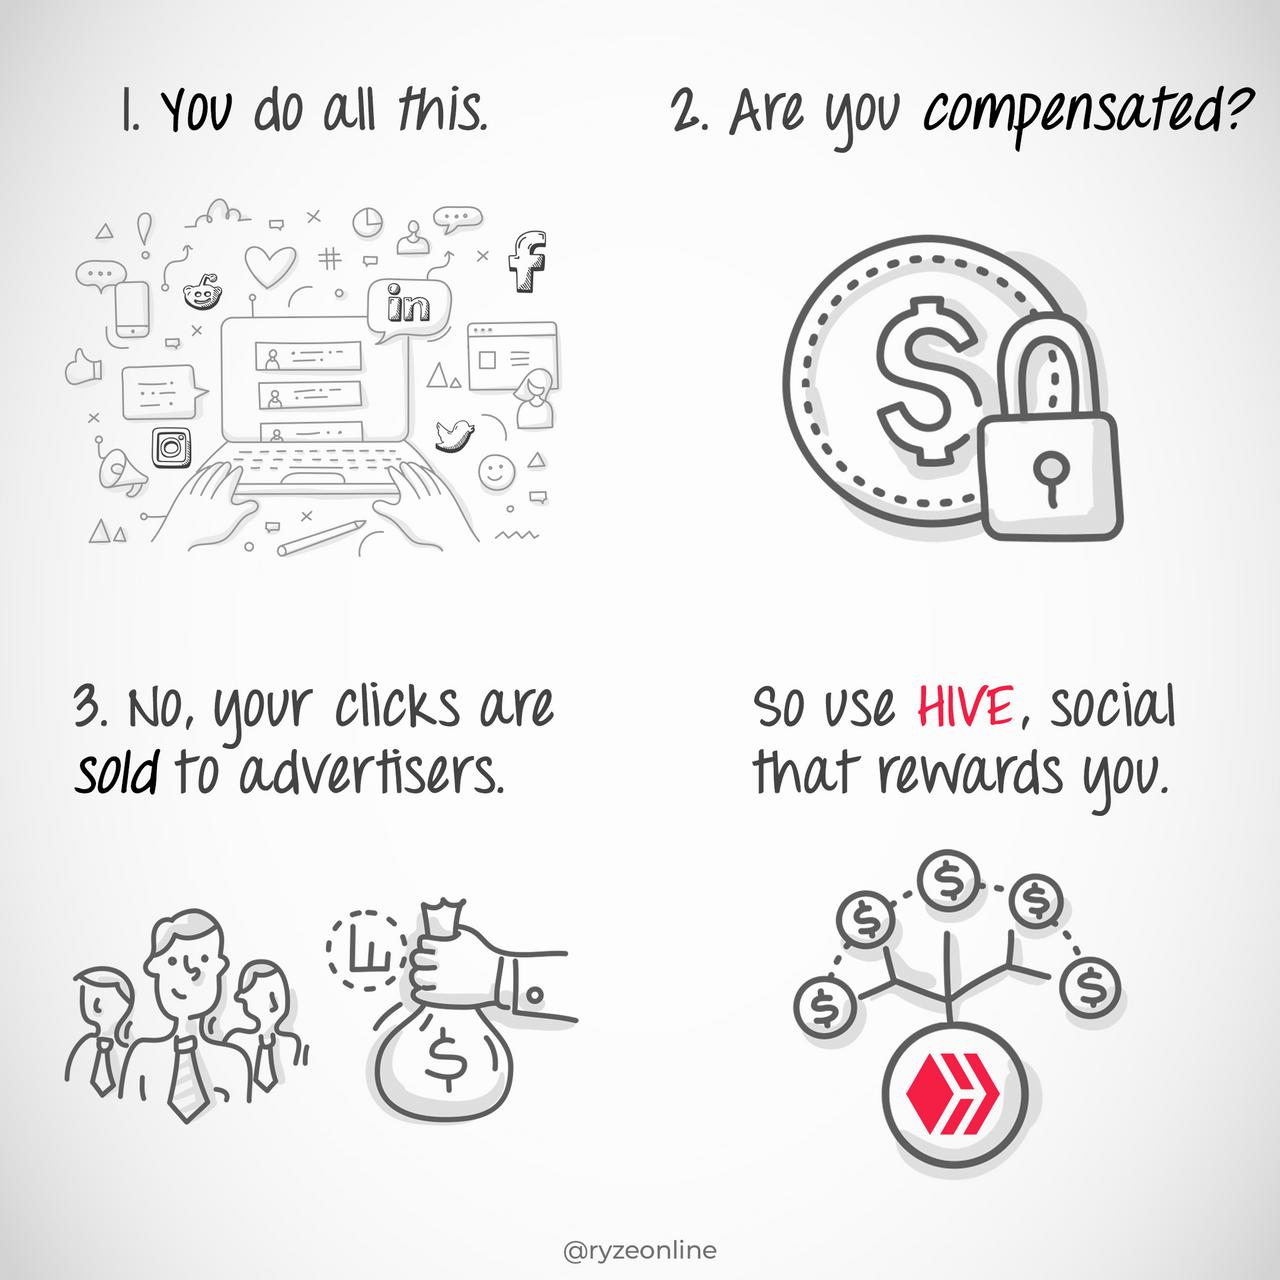 HiveBasic_010_Social_Rewards.png